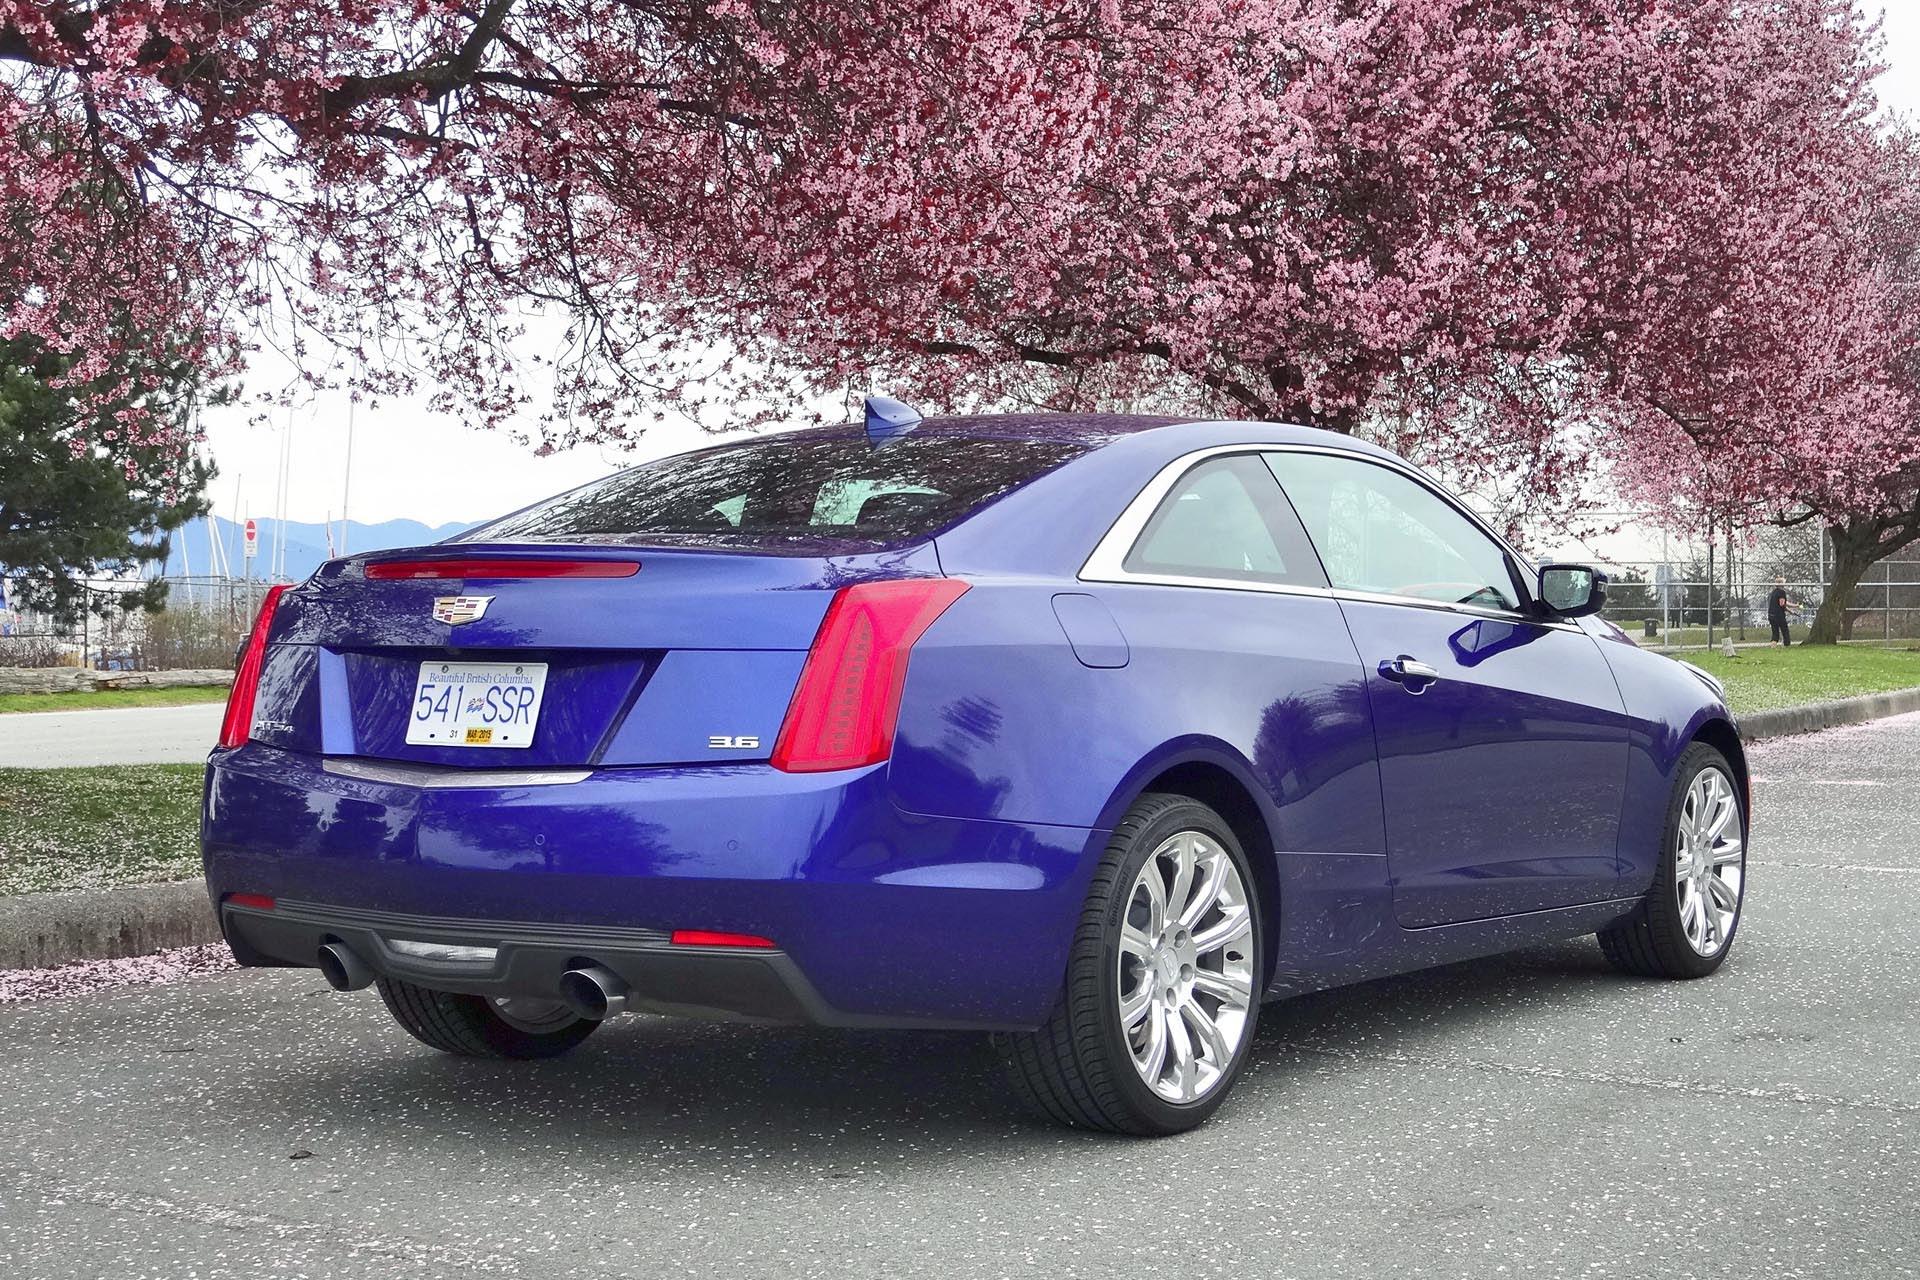 2015 Cadillac ATS Coupe V6 AWD - Autos.ca